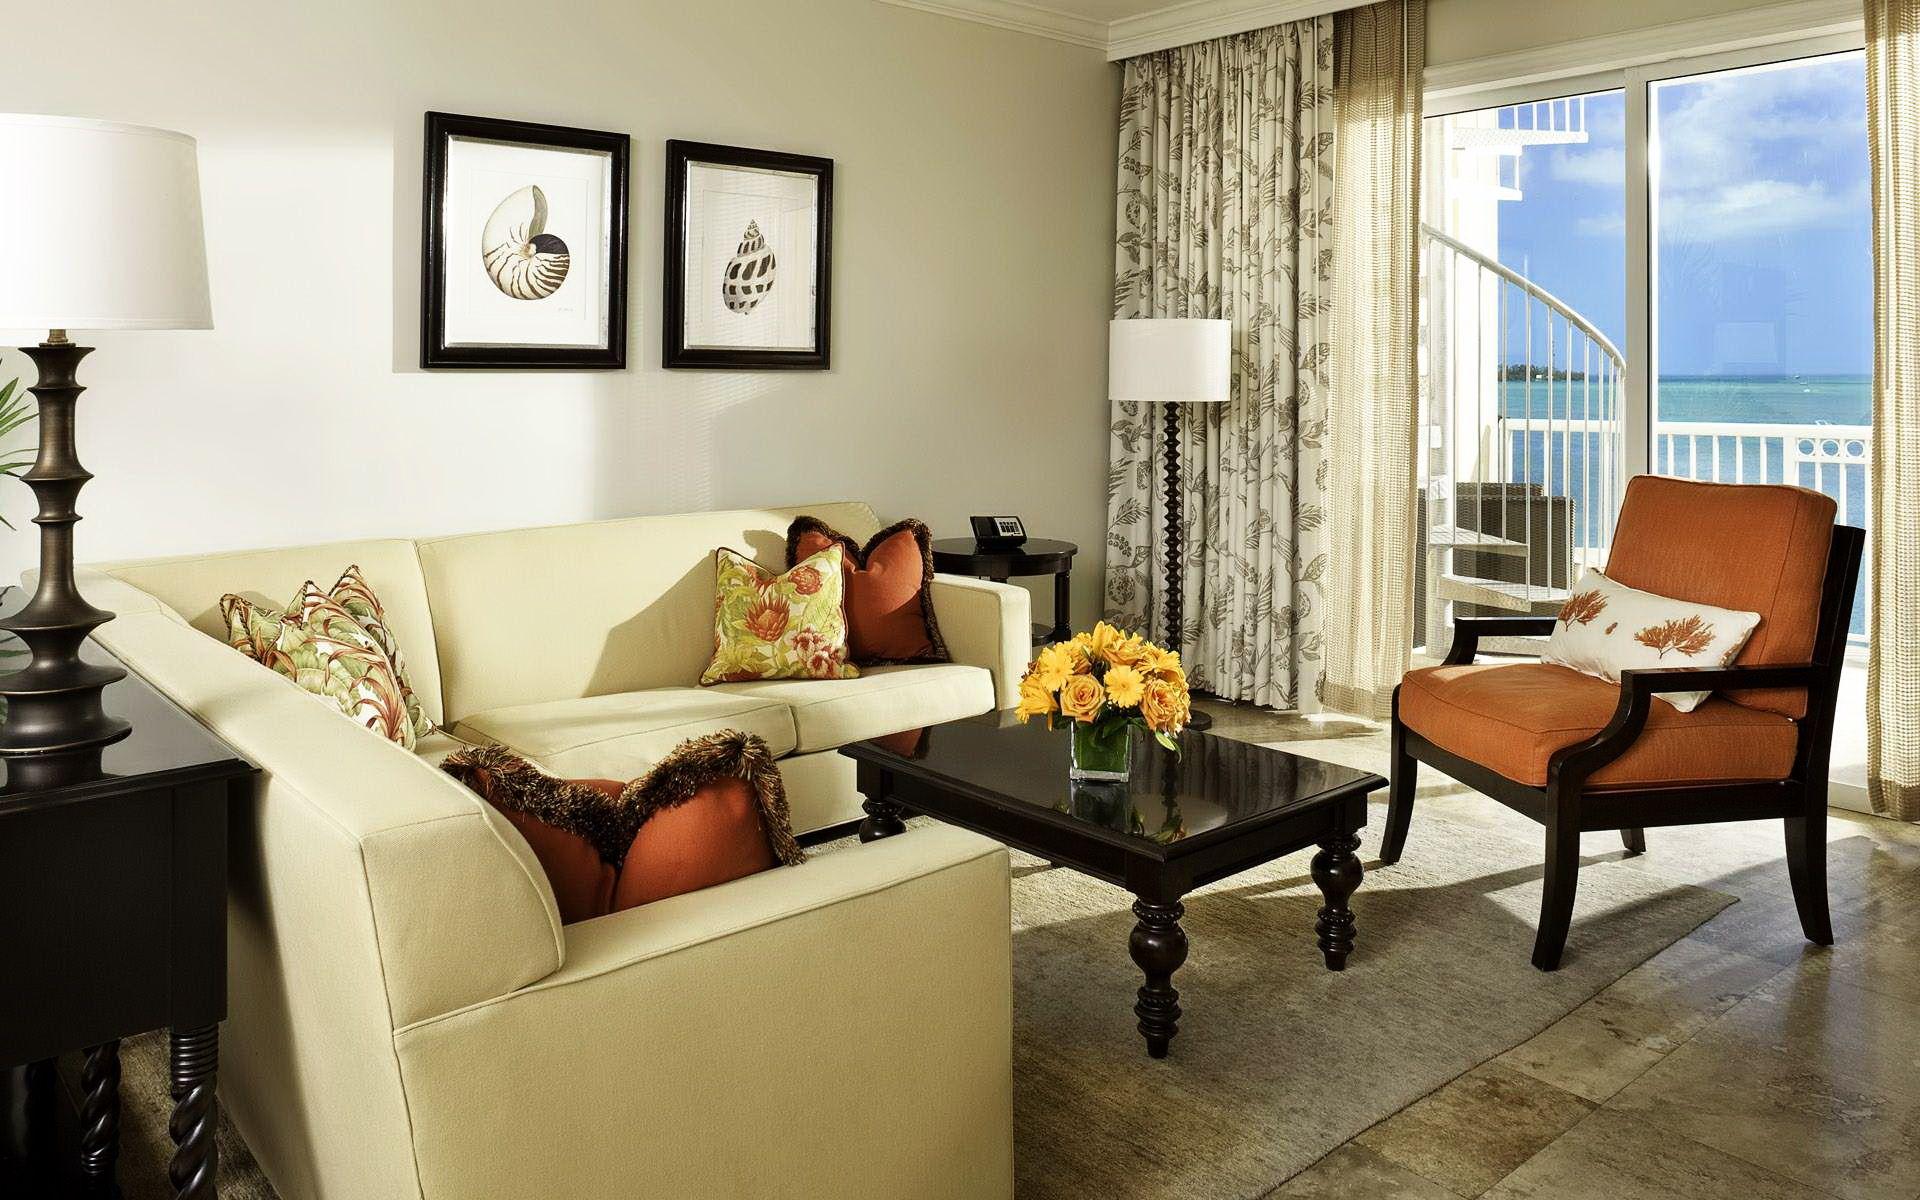 74 Small Living Room Design Ideas | Small living room designs ...